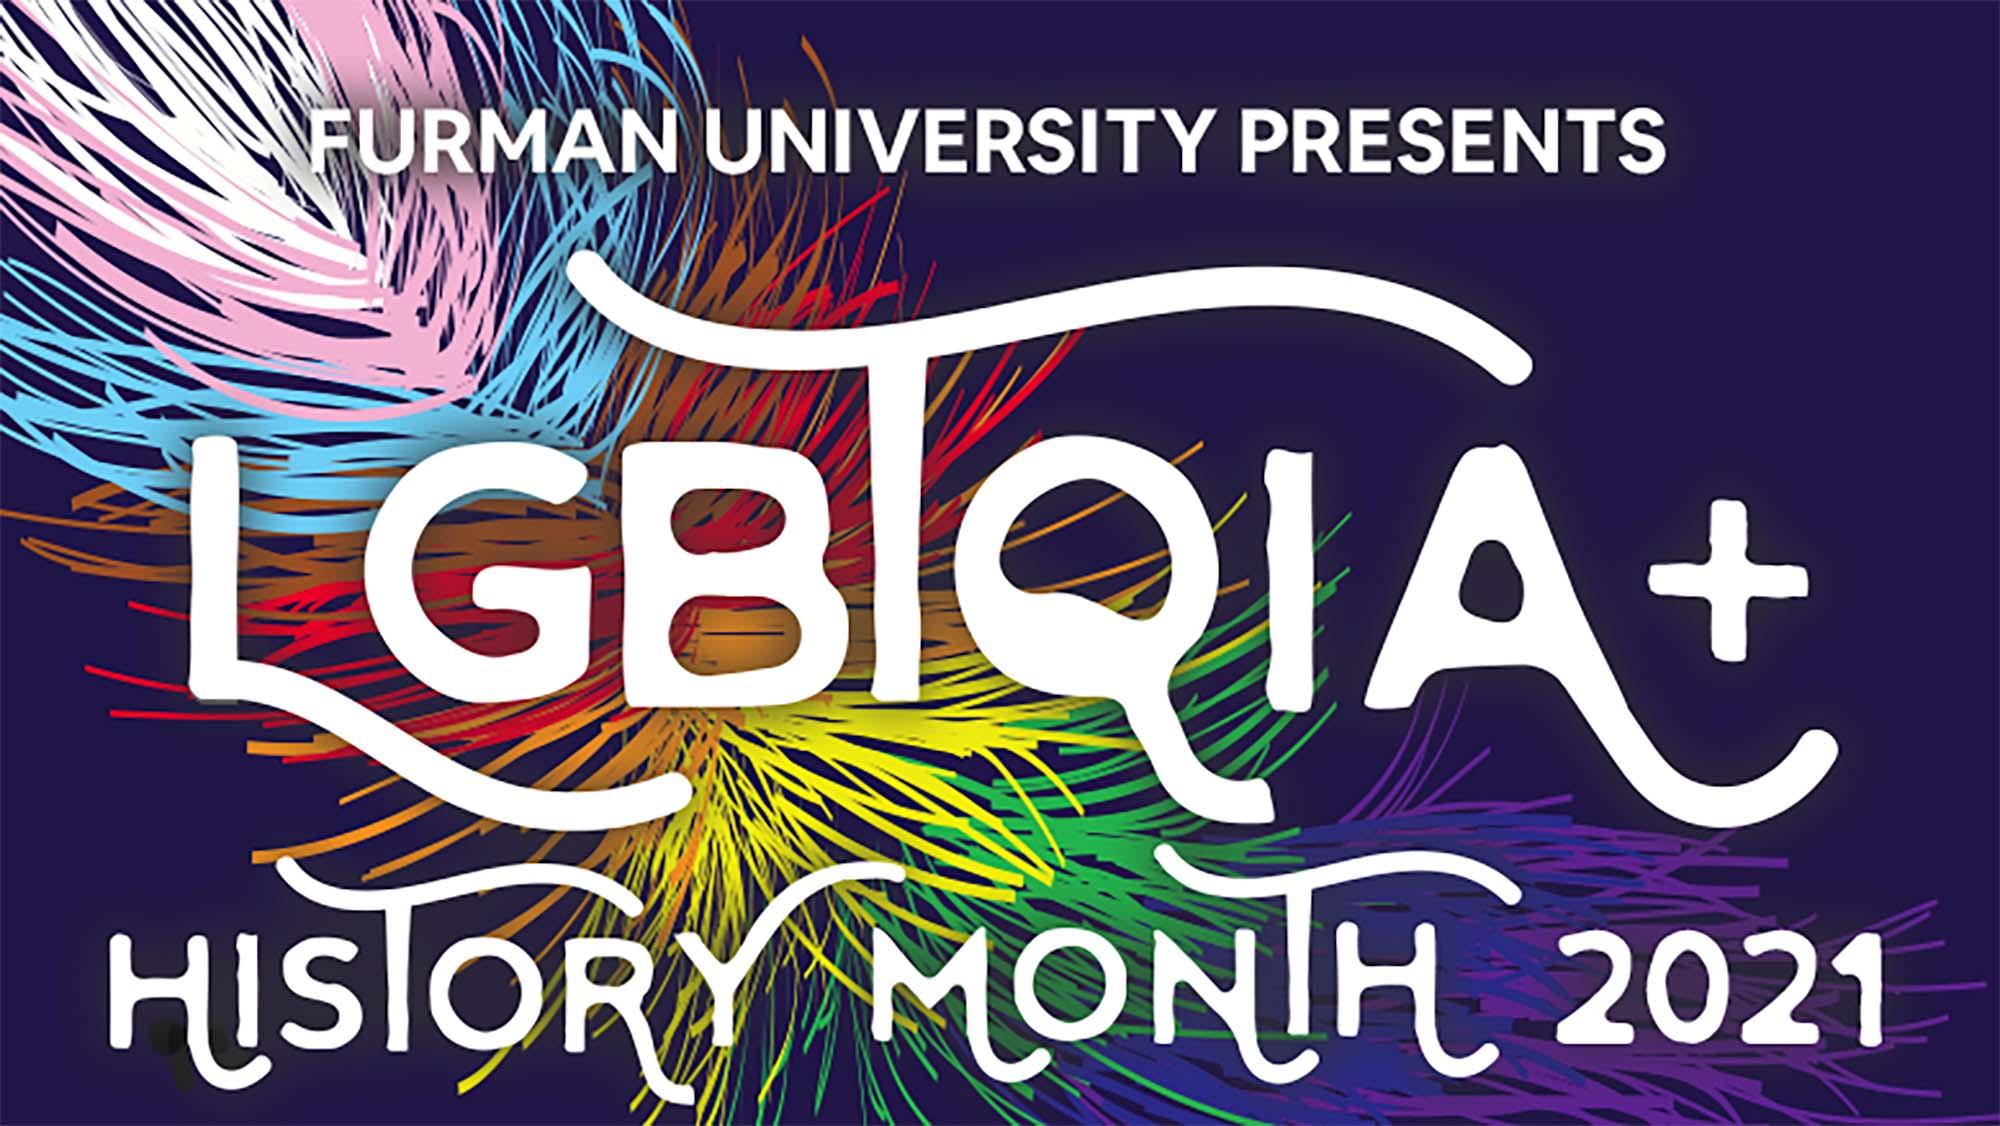 LGBTQIA+ History Month 2021 logo